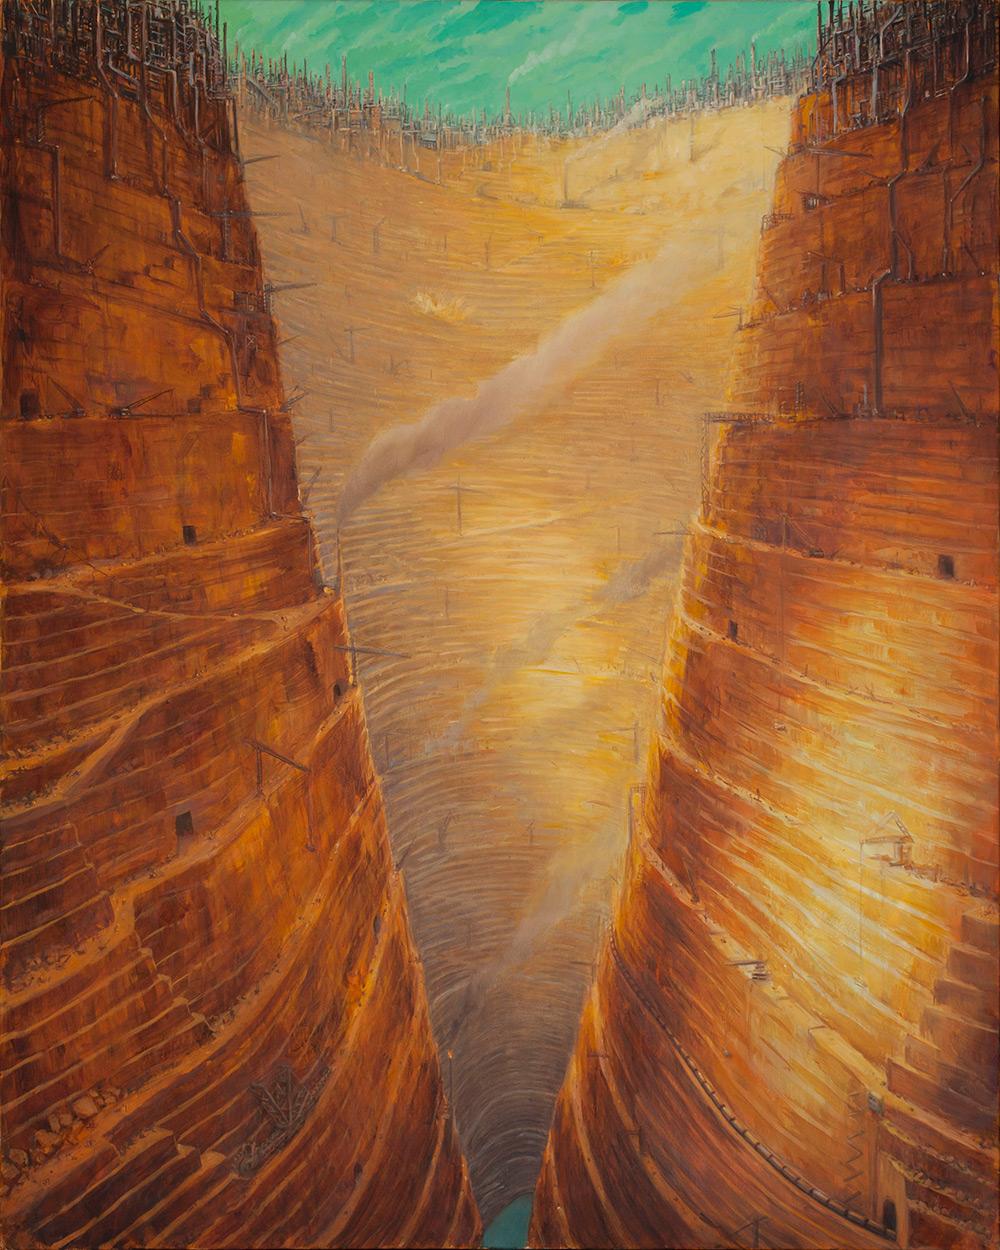 Michael Kerbow - Painting Surreal 7-89632